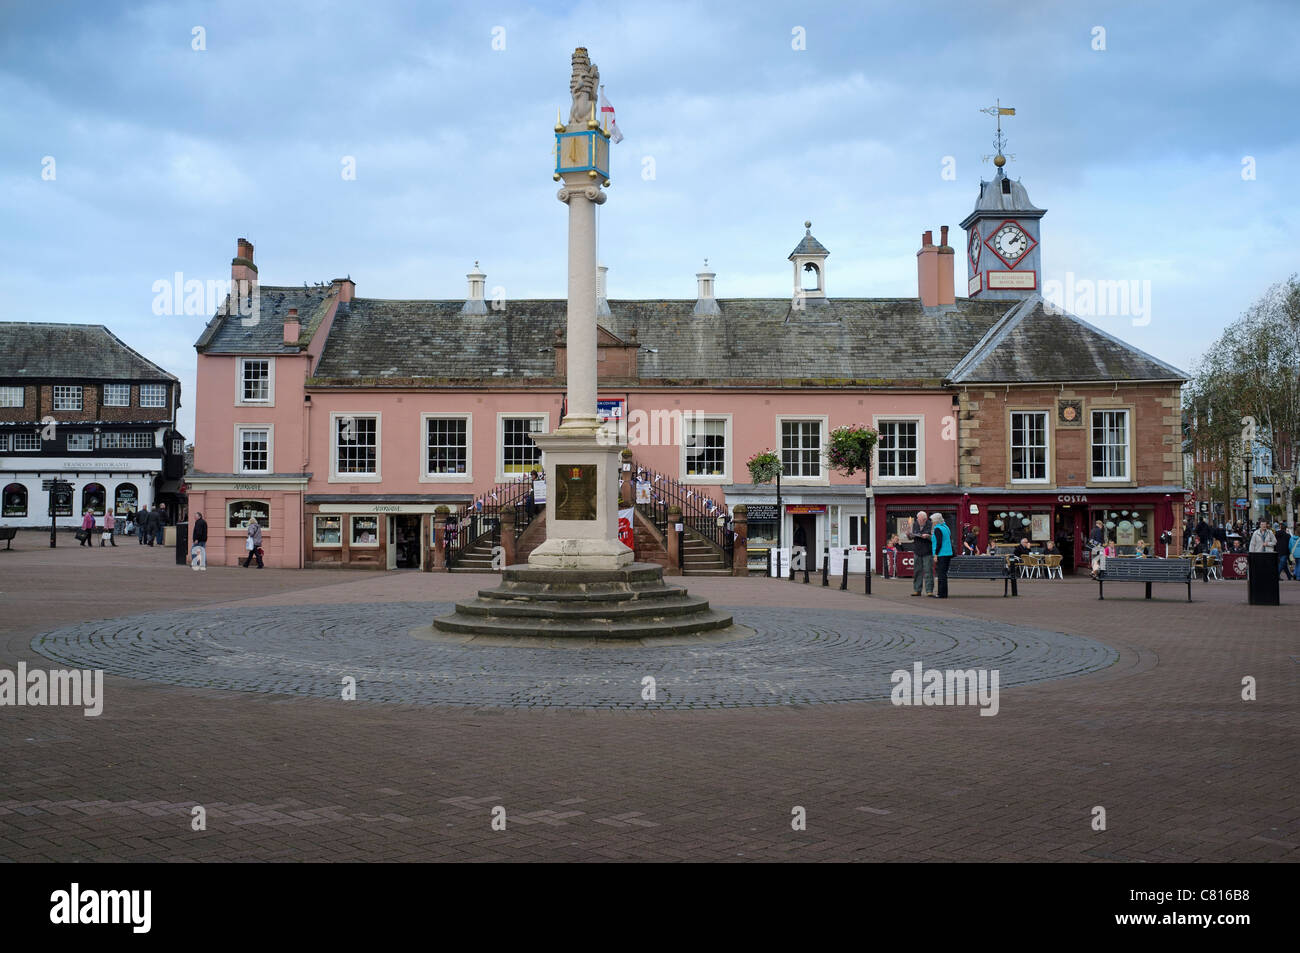 Carlisle, Market Square - Stock Image